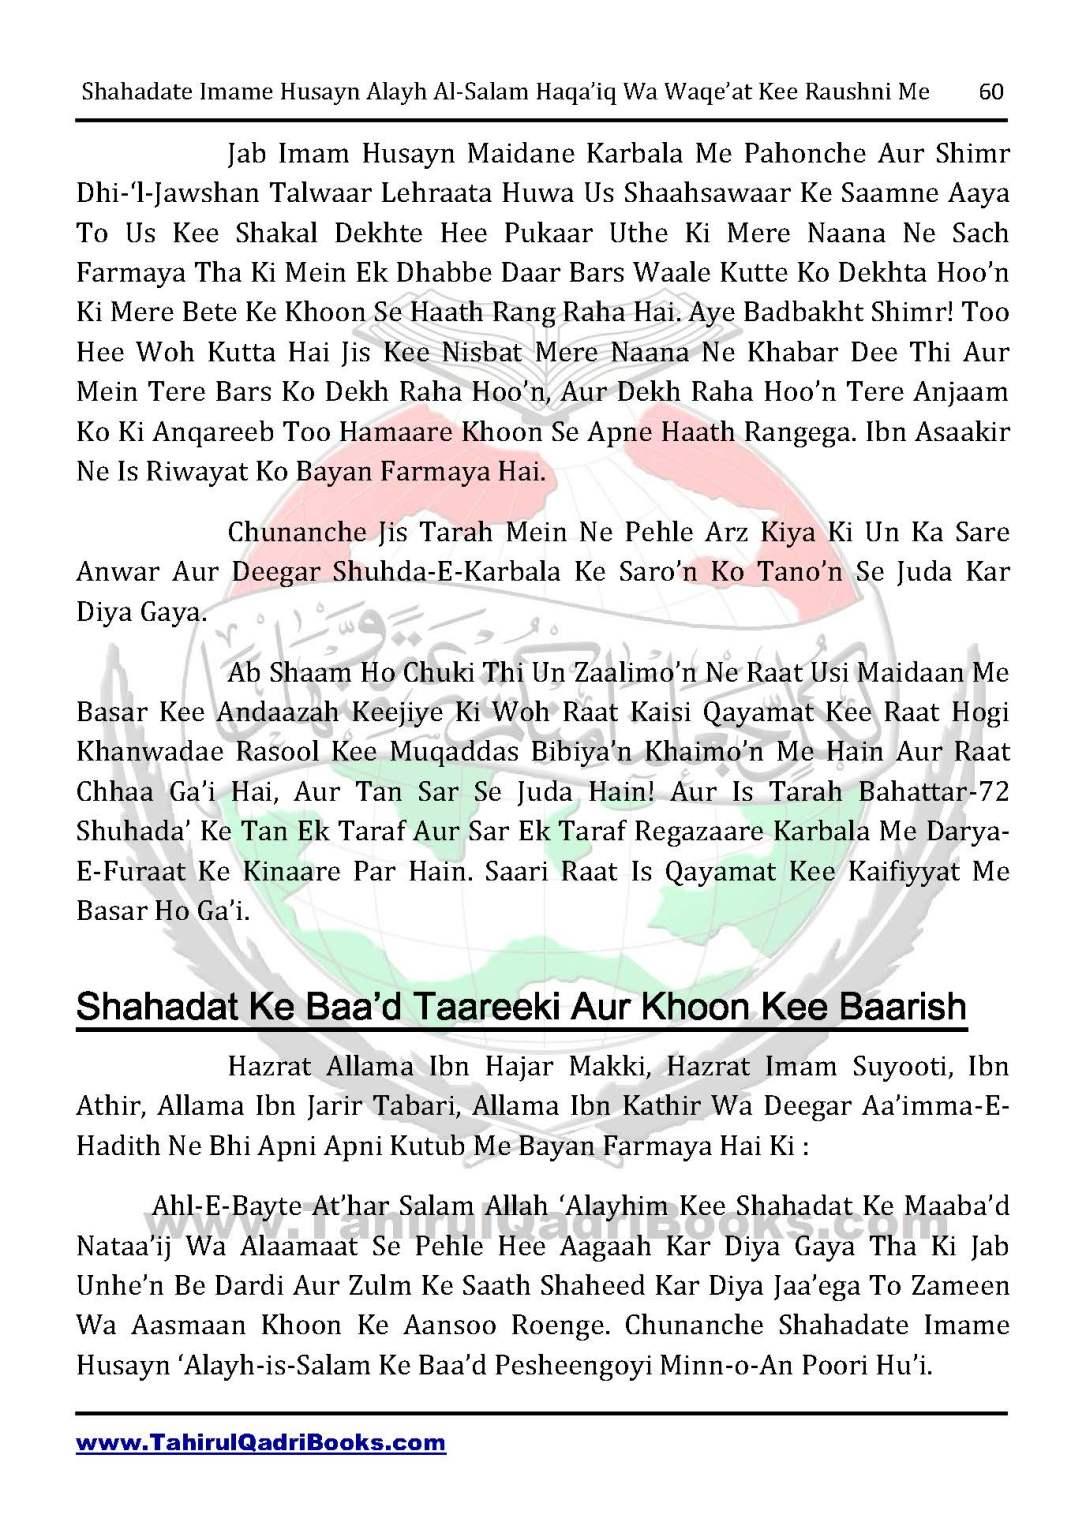 shahadate-imame-husayn-alayh-is-salam-haqaiq-wa-waqe_at-kee-raushni-me-in-roman-urdu-unlocked_Page_60